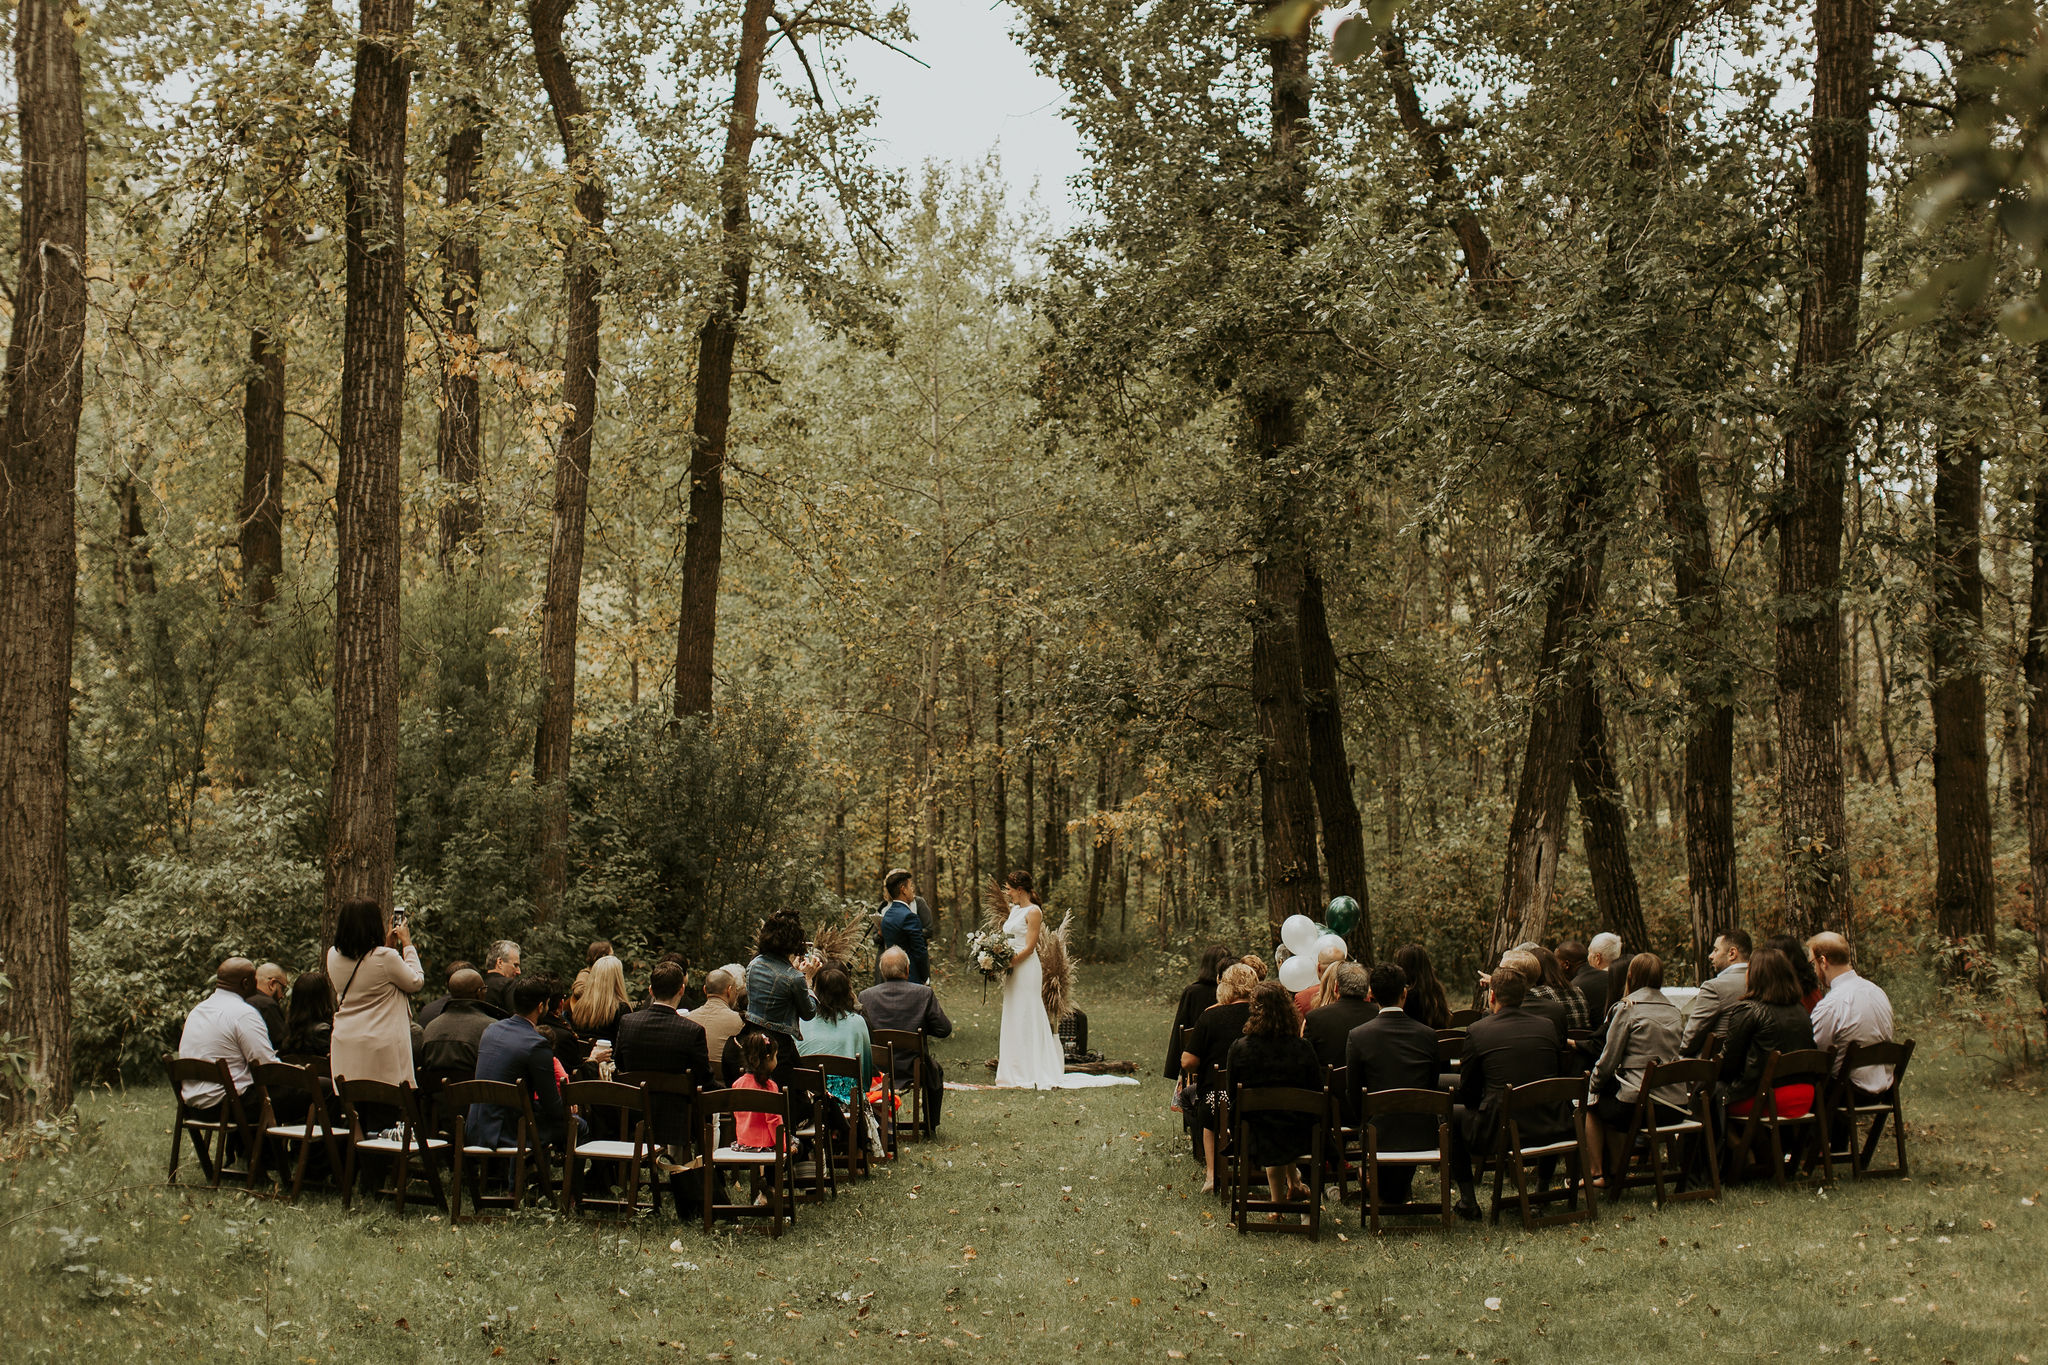 AK_Wedding_Ceremony-50.jpg